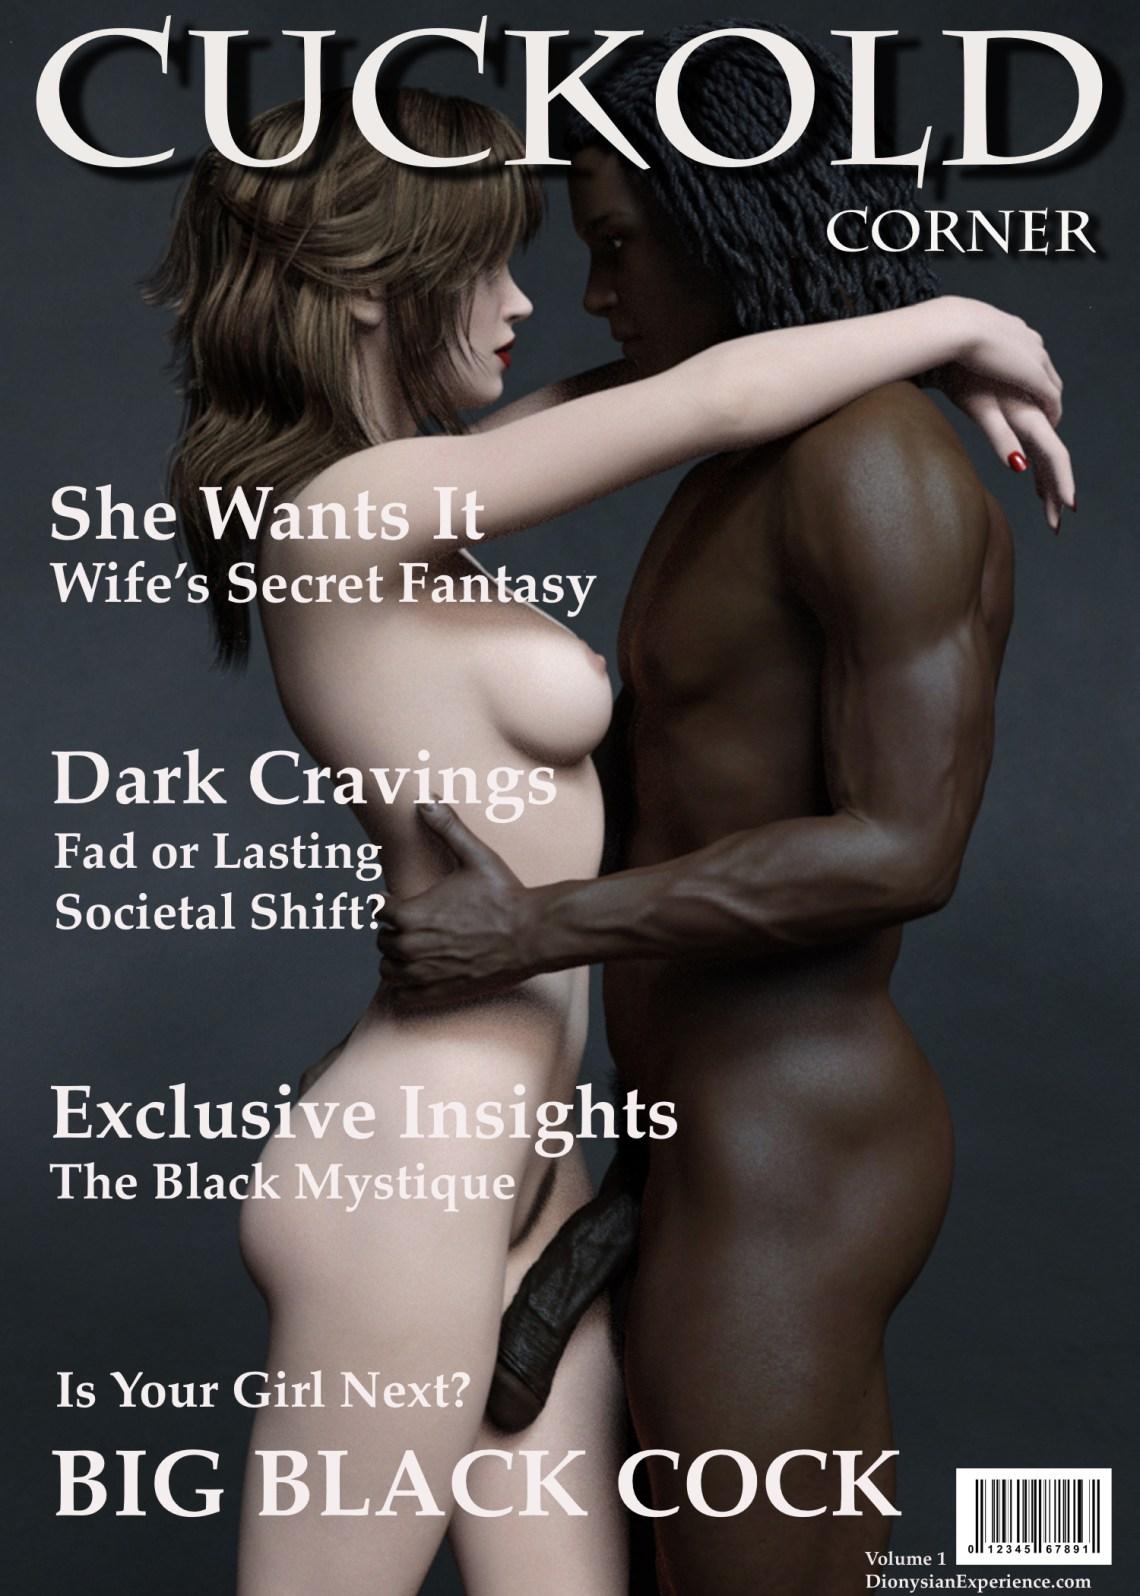 Cuckold Corner Vol 1